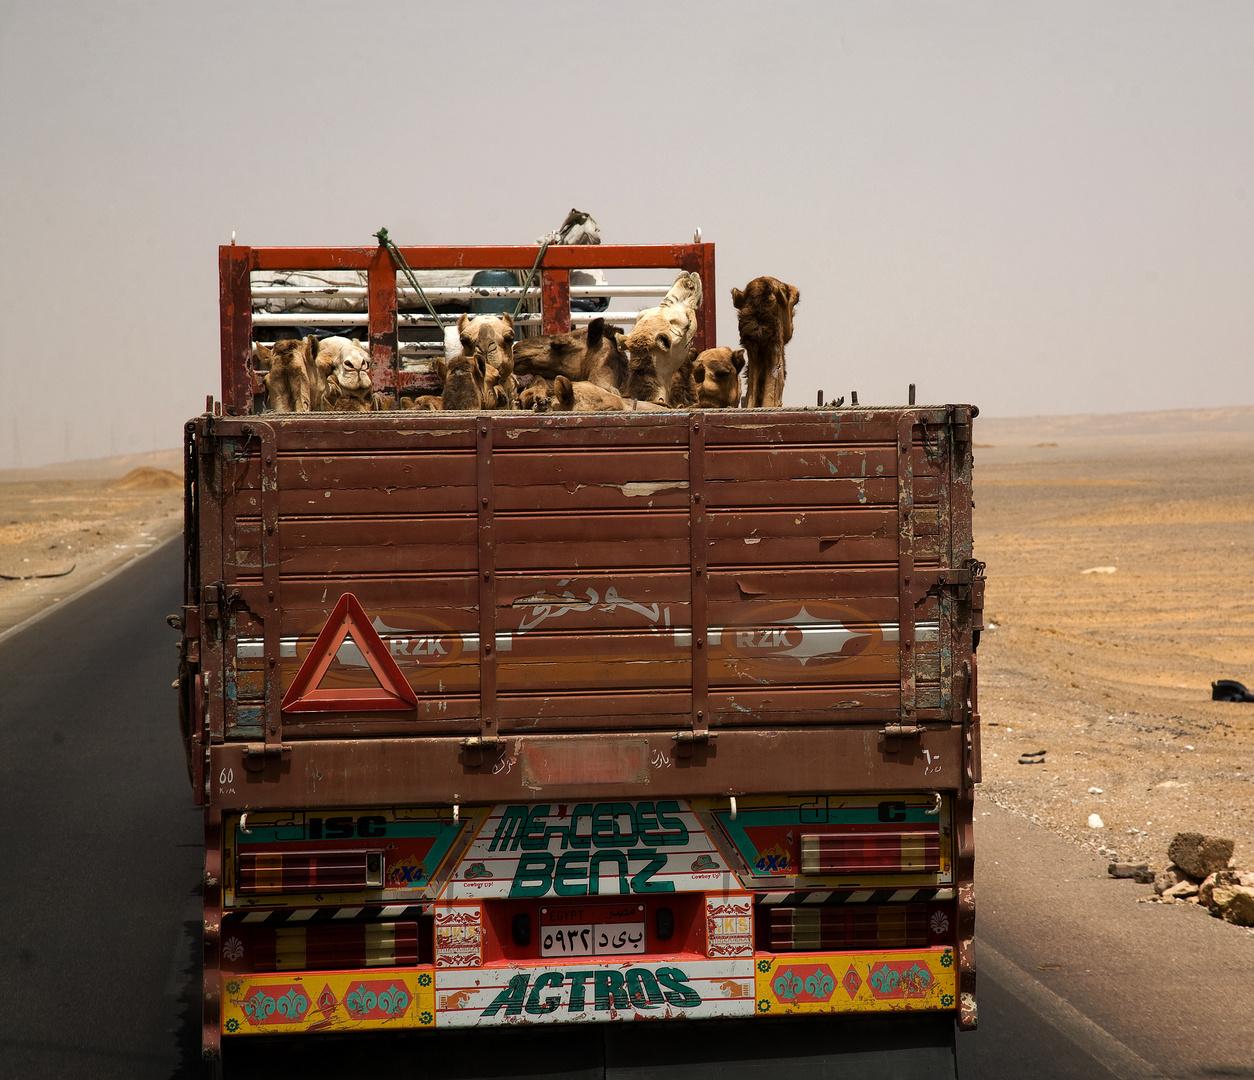 Camel-Truck